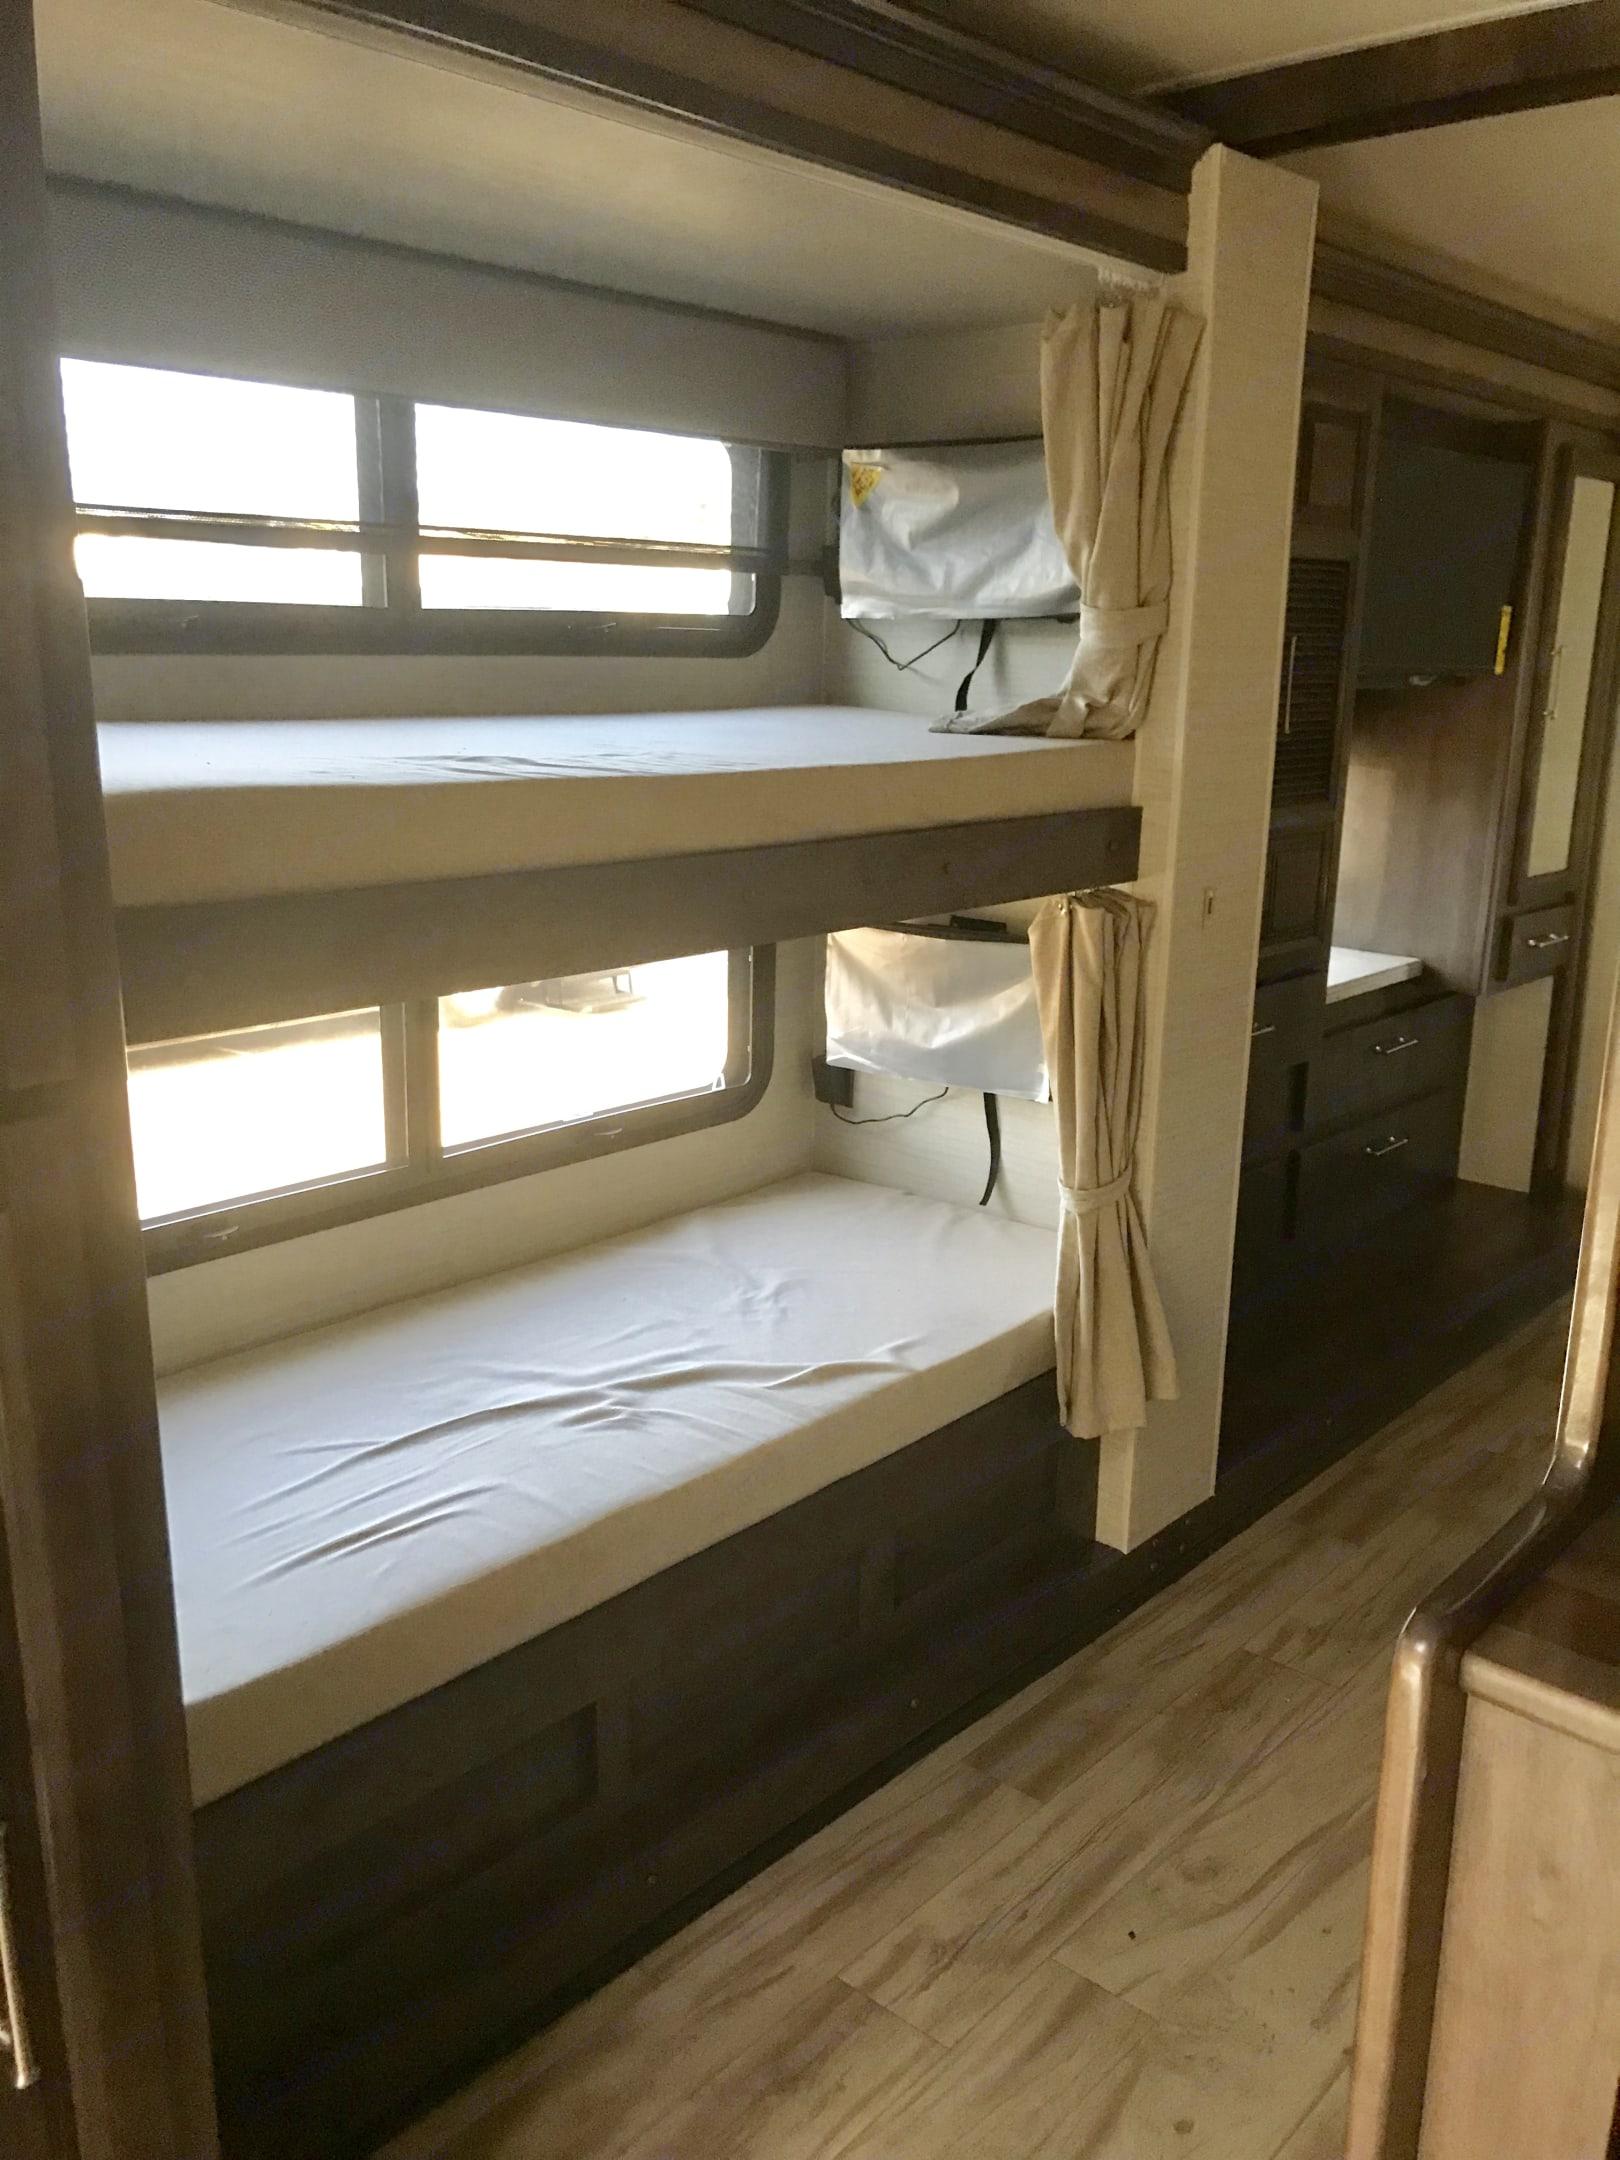 Bunk Beds. Entegra Coach Emblem 2019